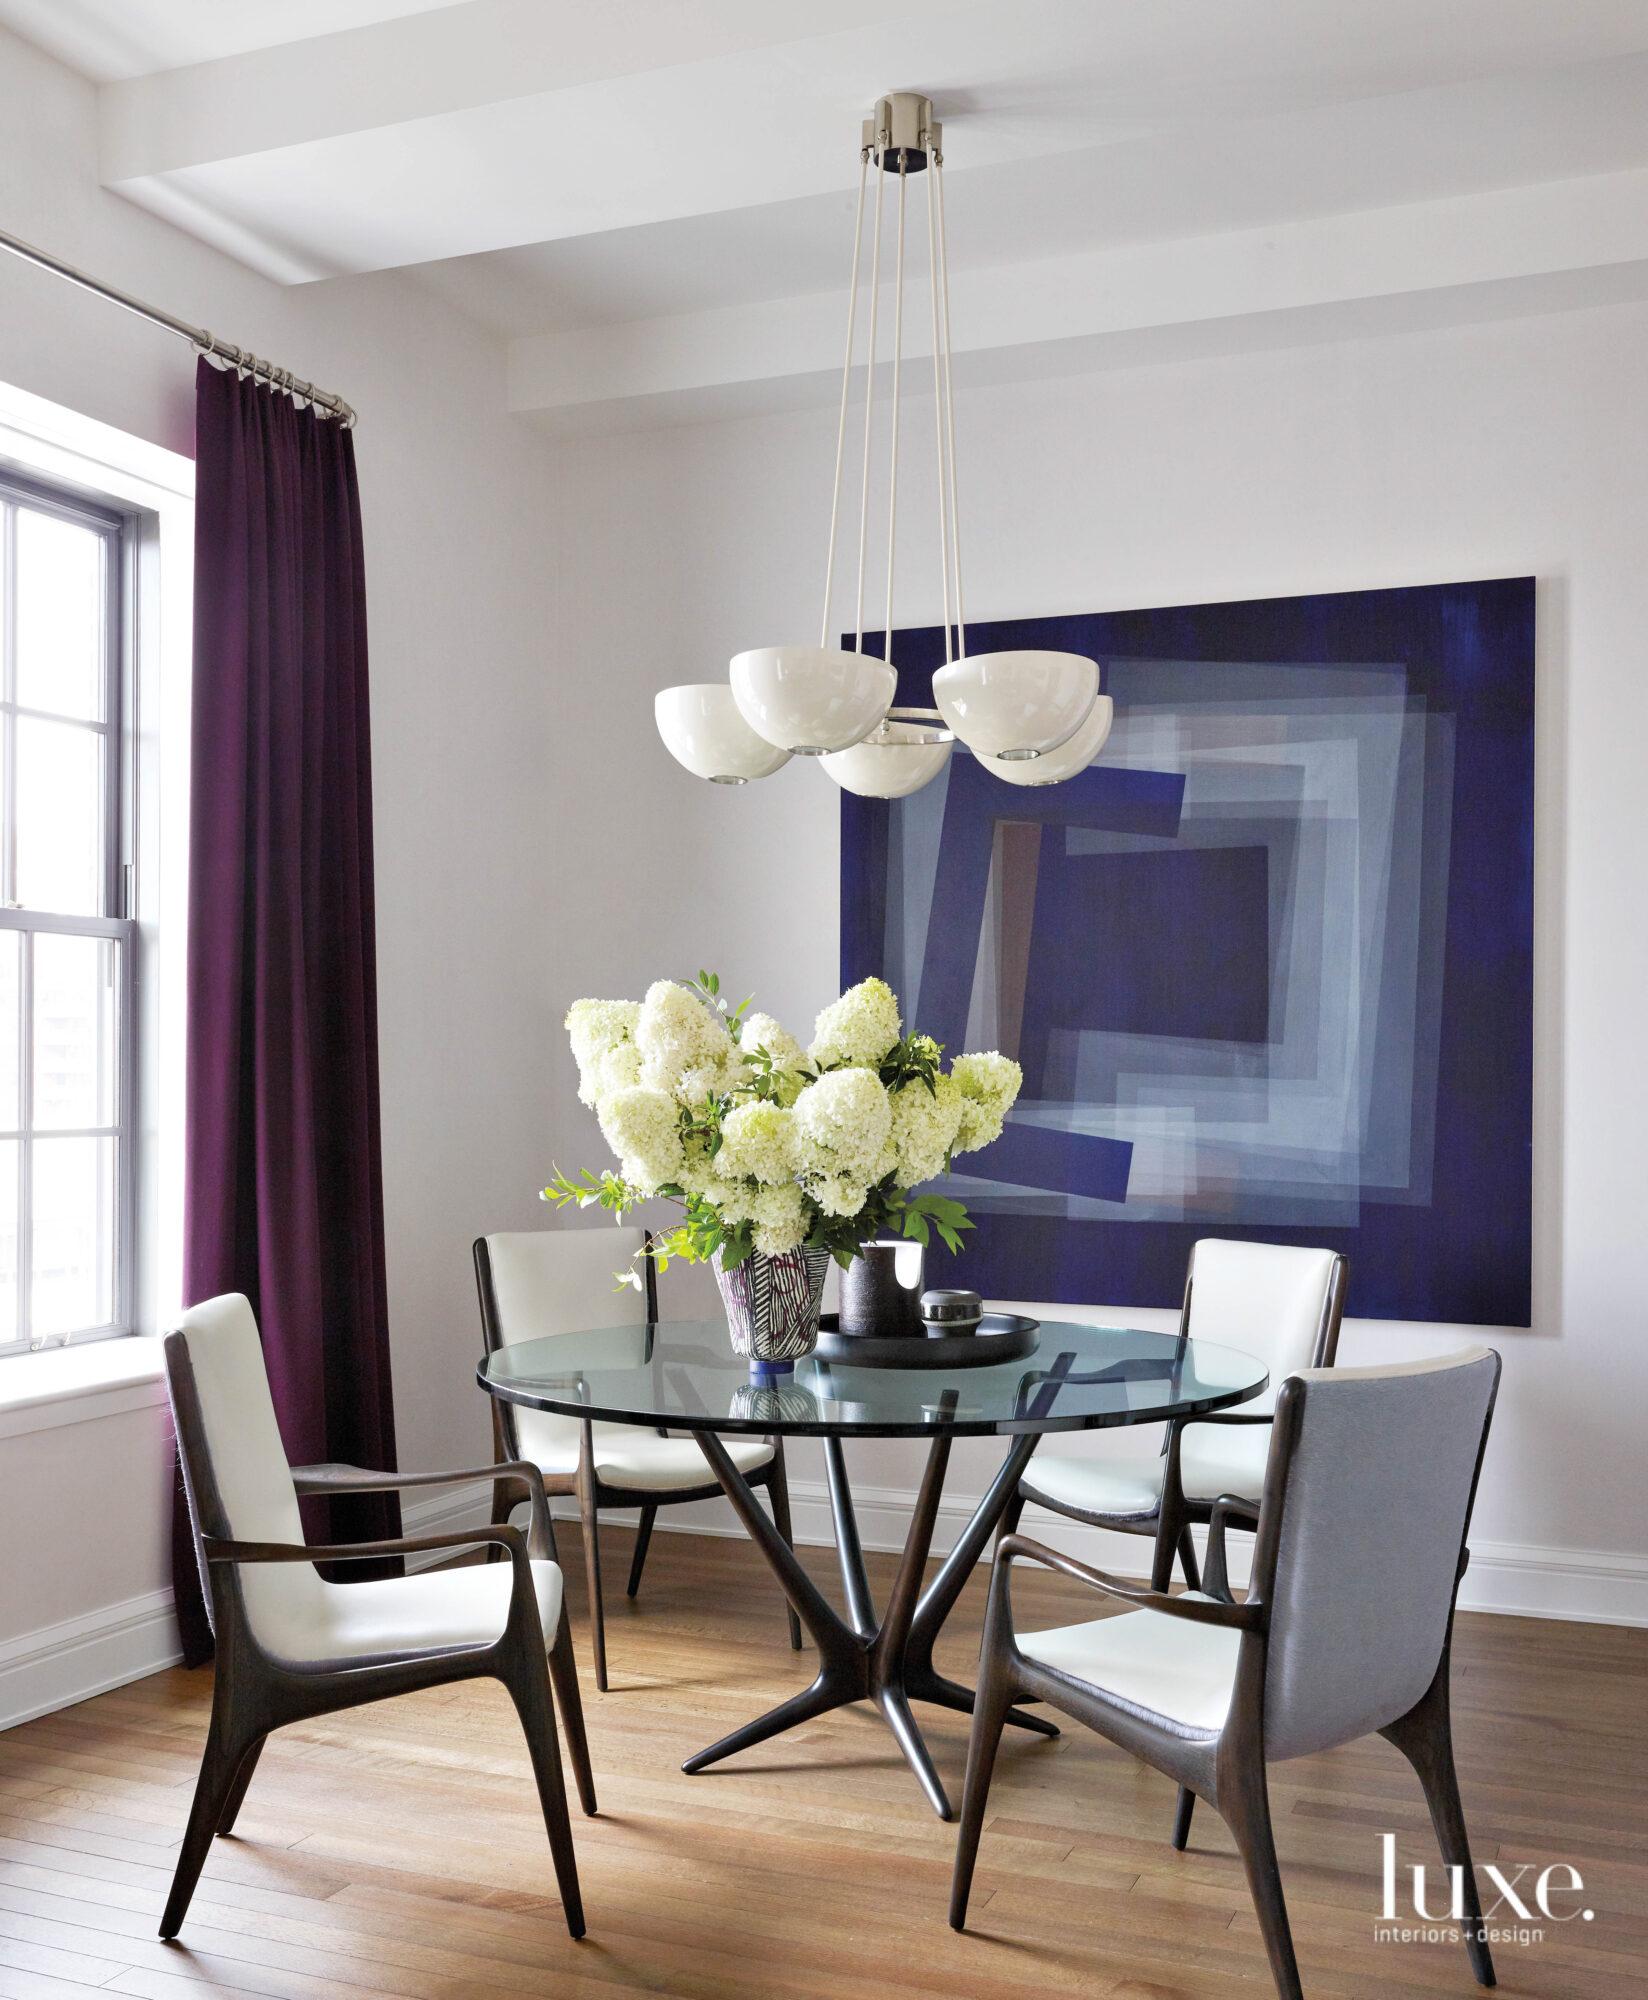 Dark blue decor surrounds a...